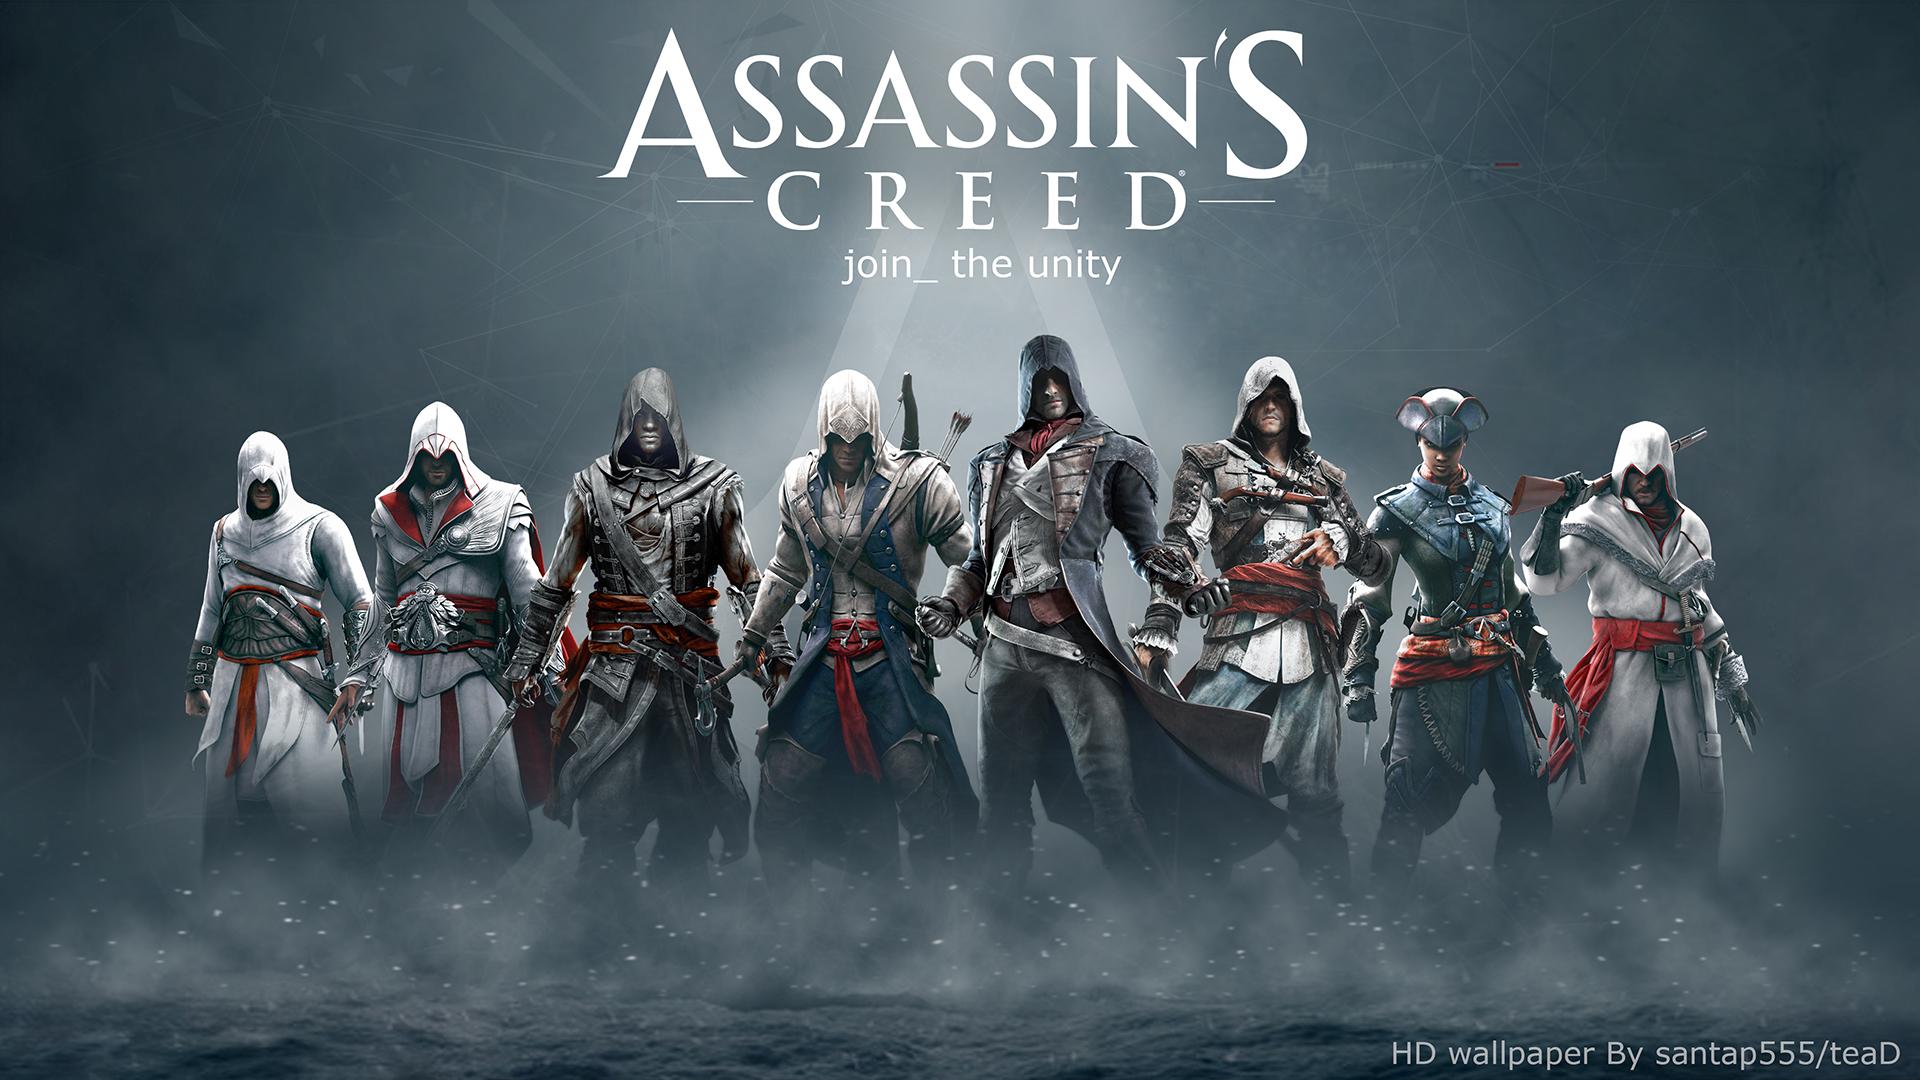 Assassins Creed HD Wallpaper By TeaD Santap555 Deviantart Com